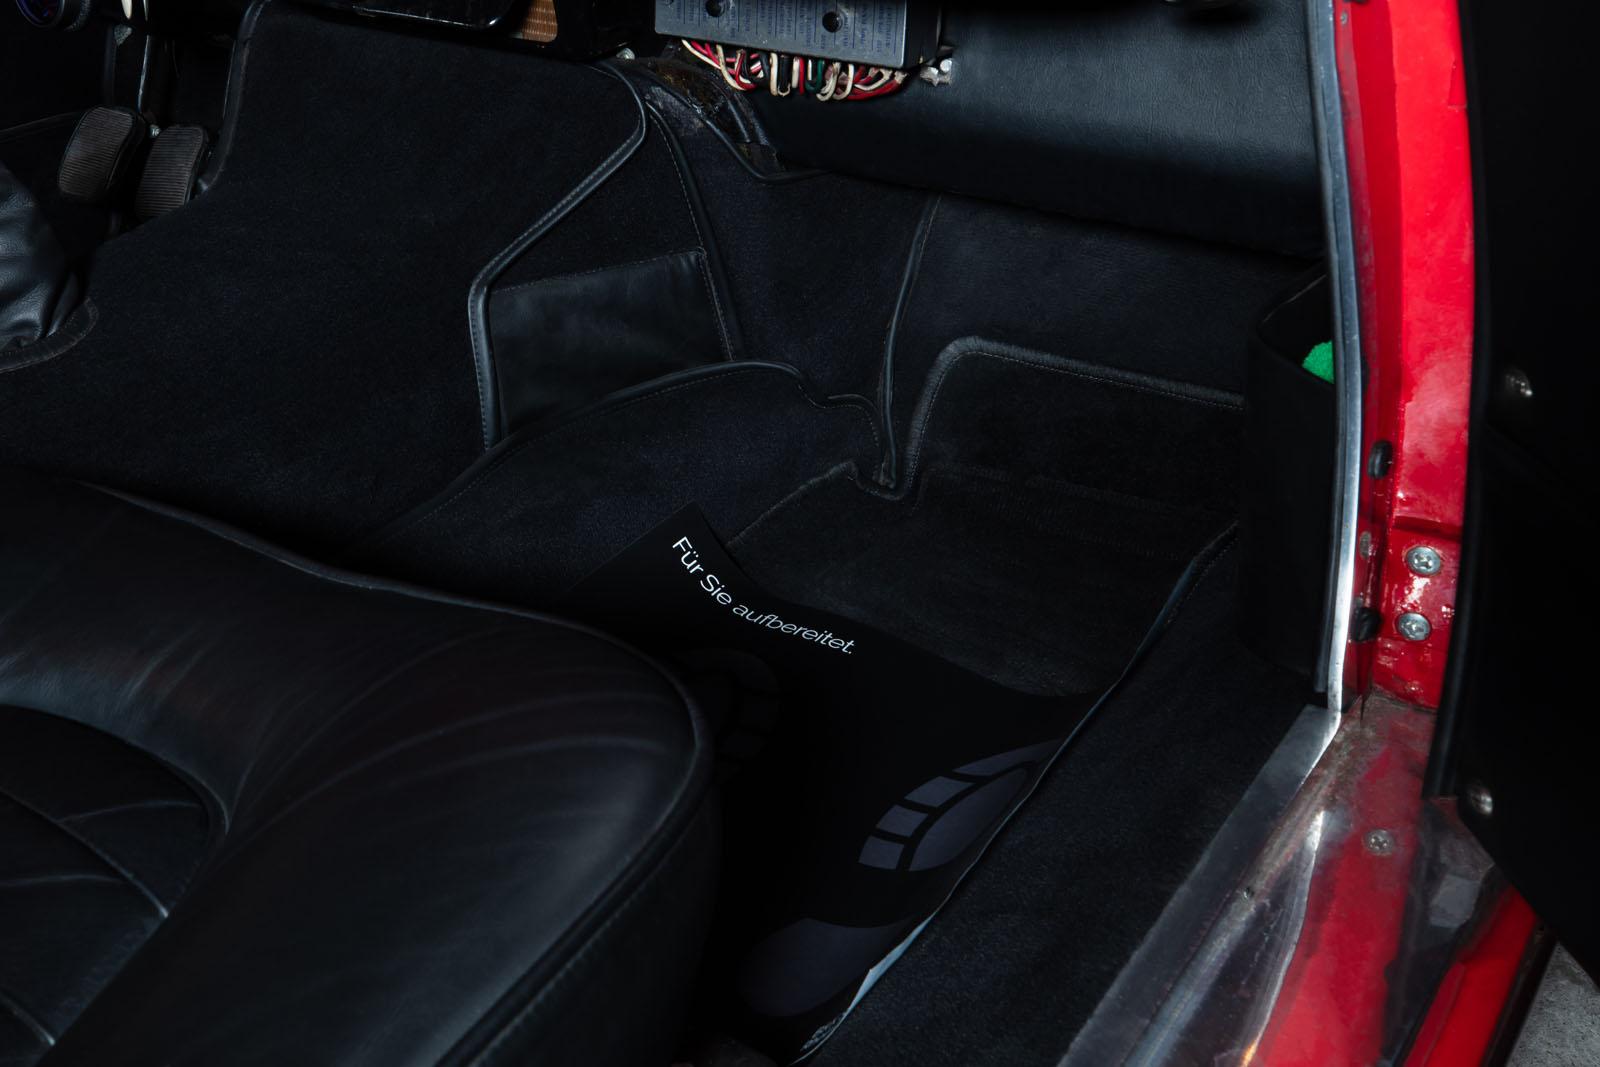 Maserati_3500_GT_Rot_Black_MAS-1742_16_w